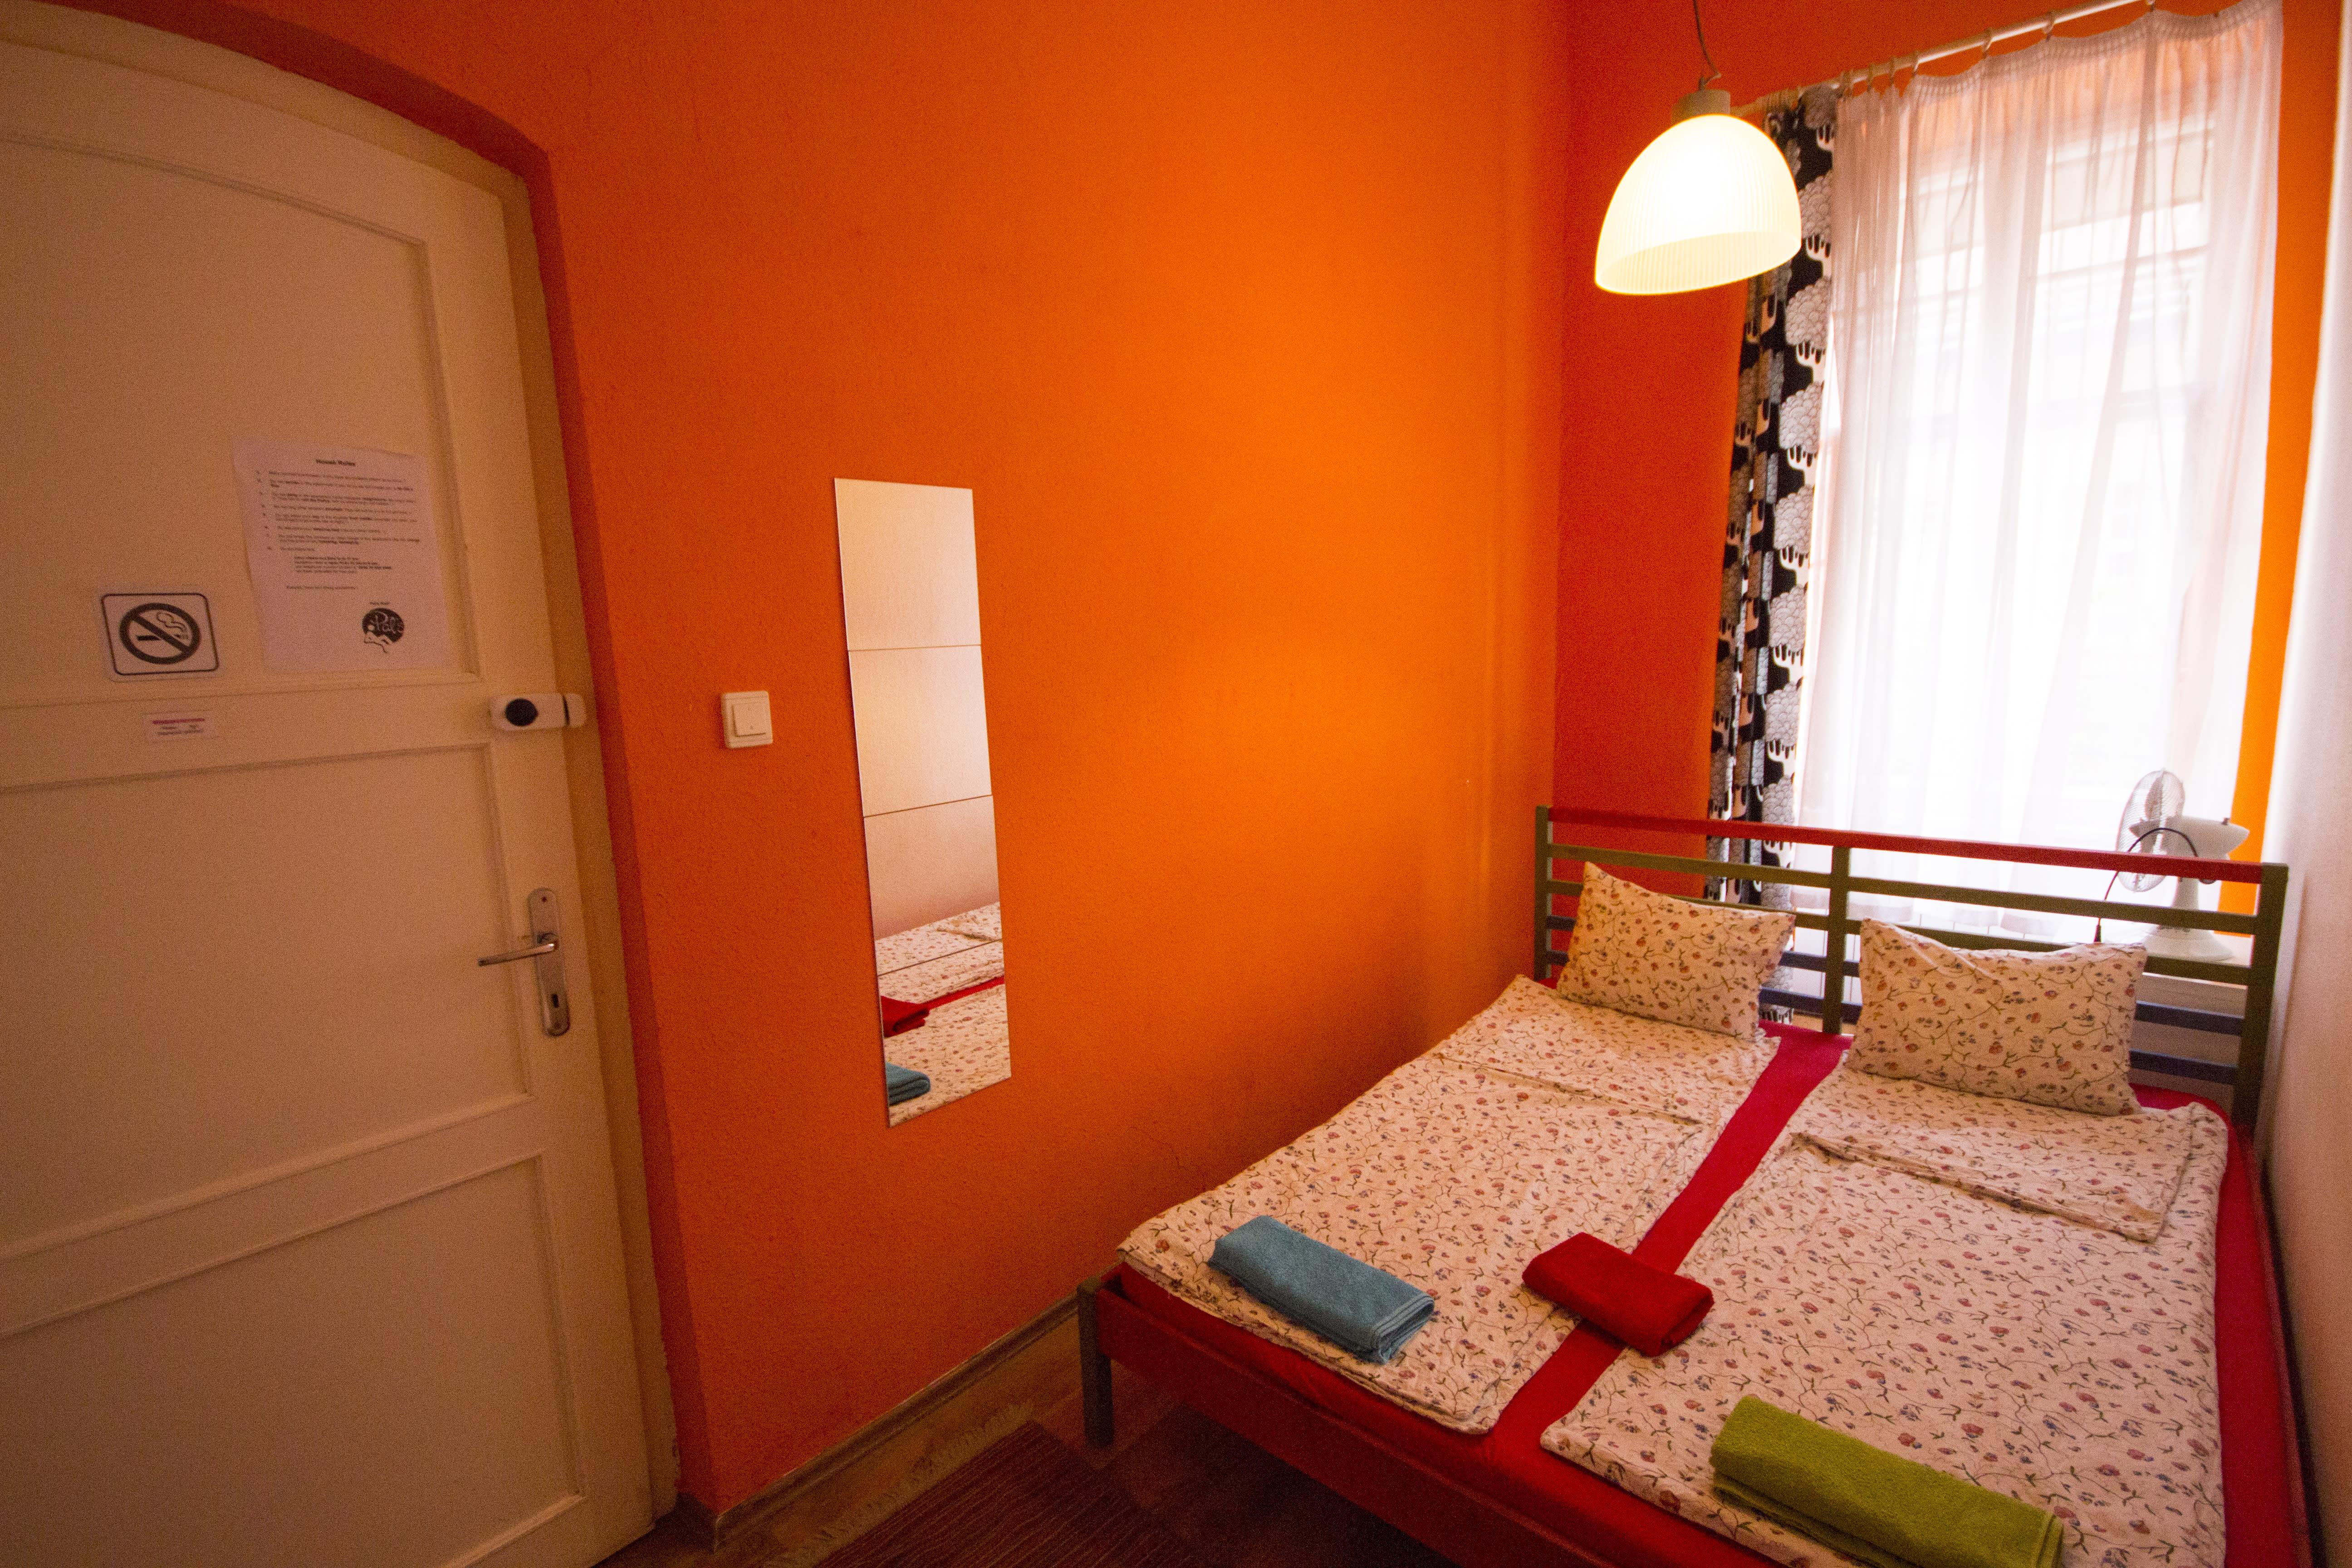 Pal's Hostel